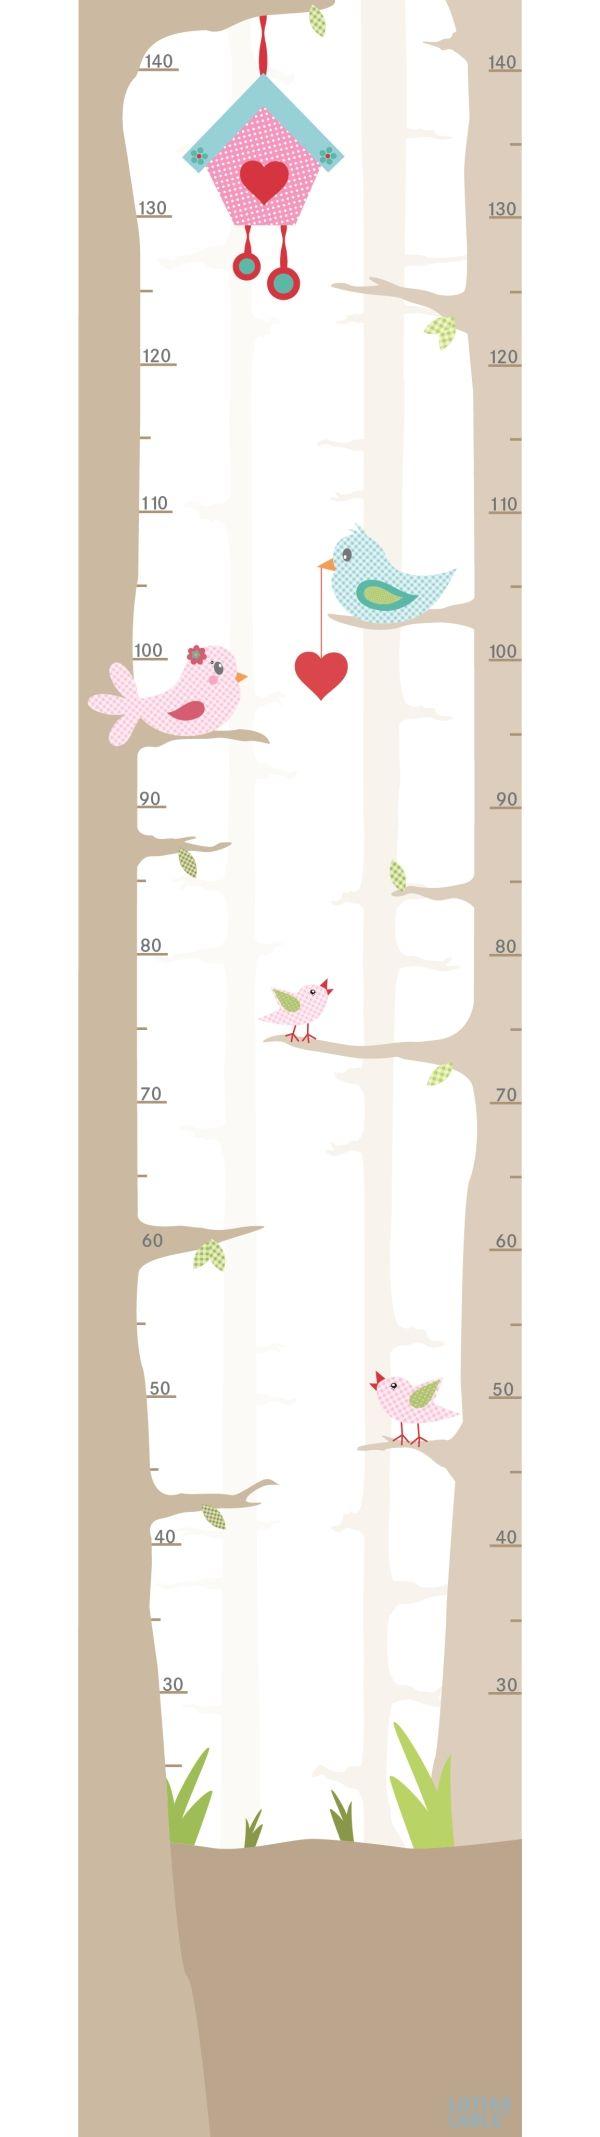 18 best Inspiração - Regua de Altura images on Pinterest | Growth ...